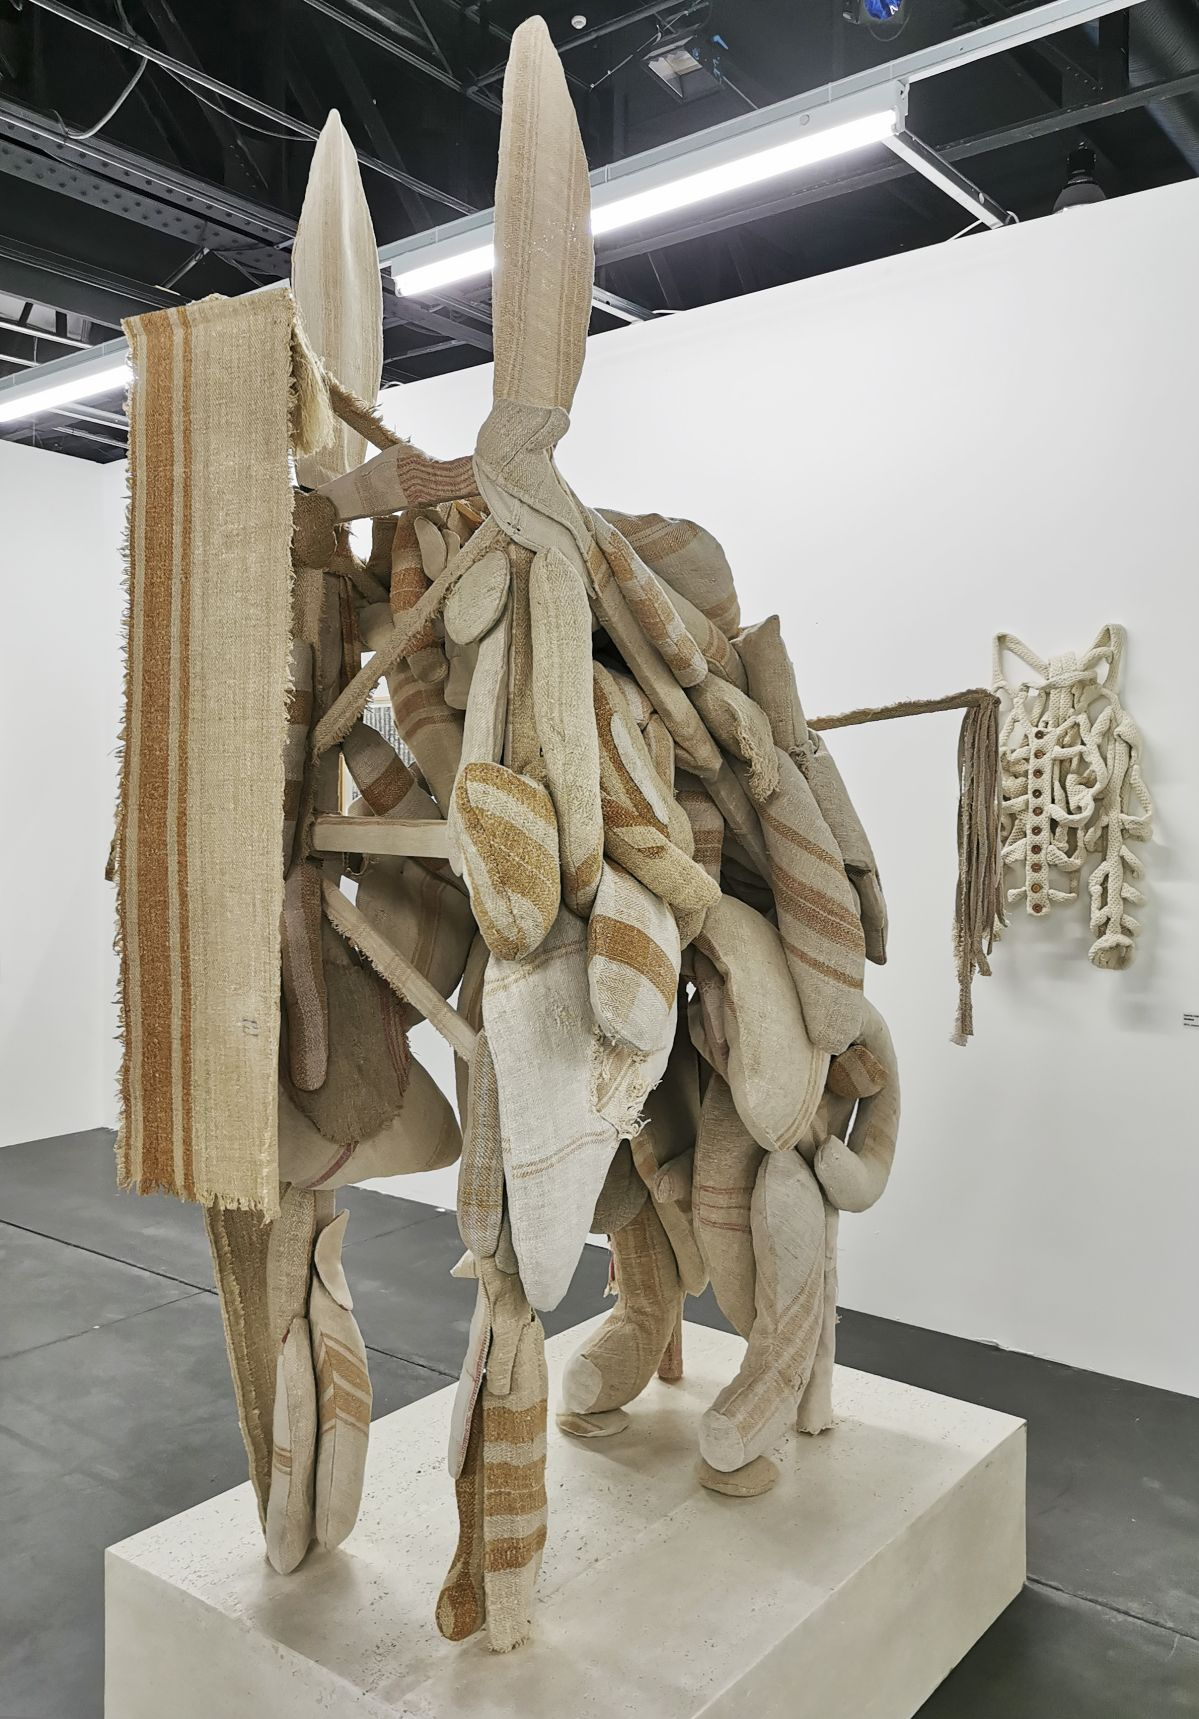 Sector One - Olah Gyarfas - Art-o-rama 2021 à la Cartonnerie - Friche la belle de Mai